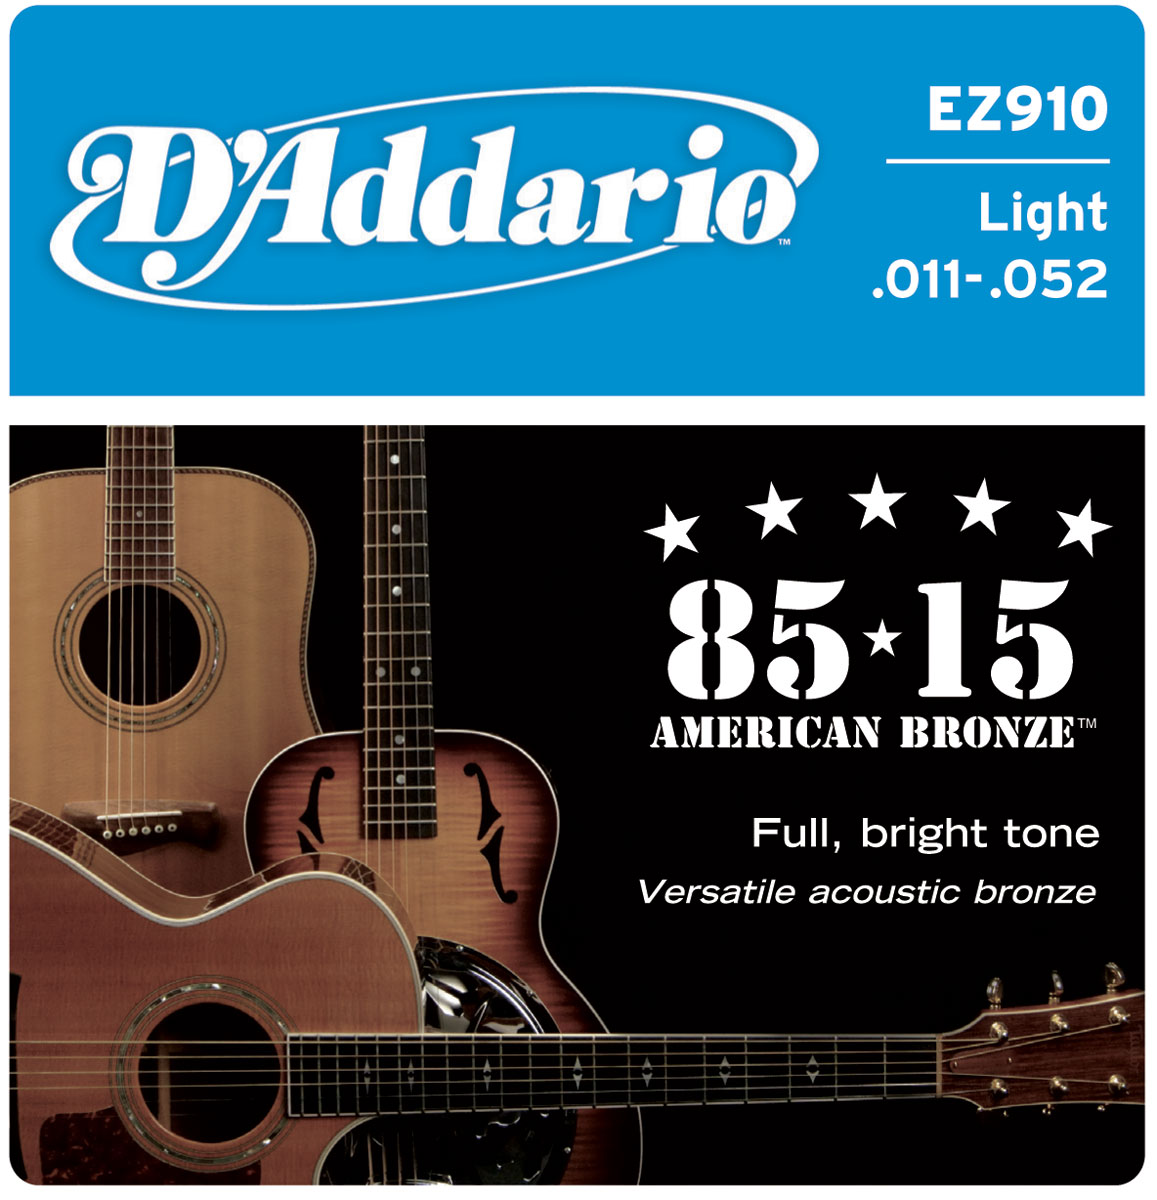 Addario EZ 910 Acoustic Guitar Strings @ Nuansa Musik